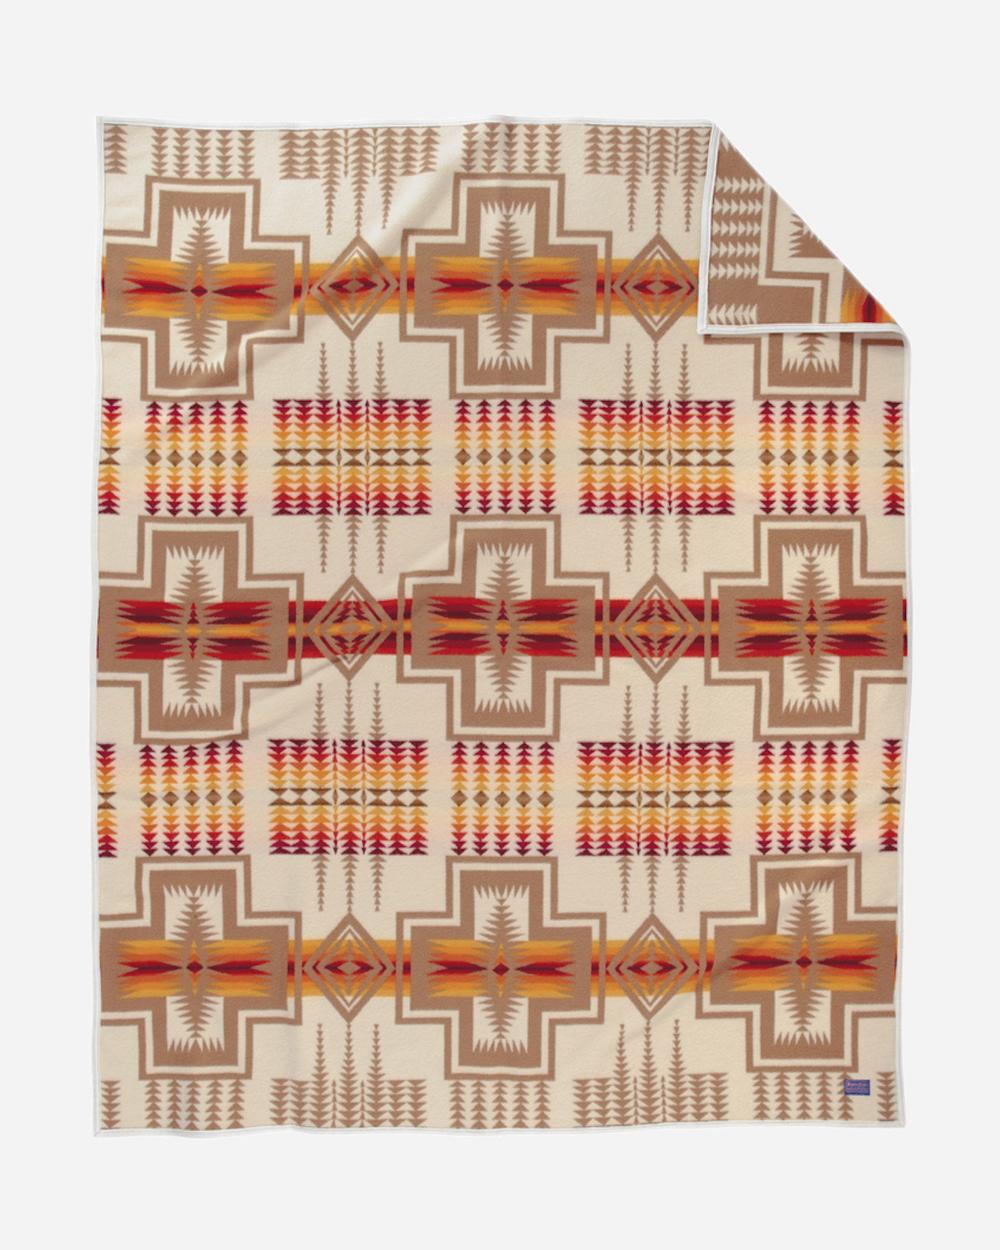 Harding Jacquard Blanket Pendleton Blanket Pendleton Woolen Mills Blanket